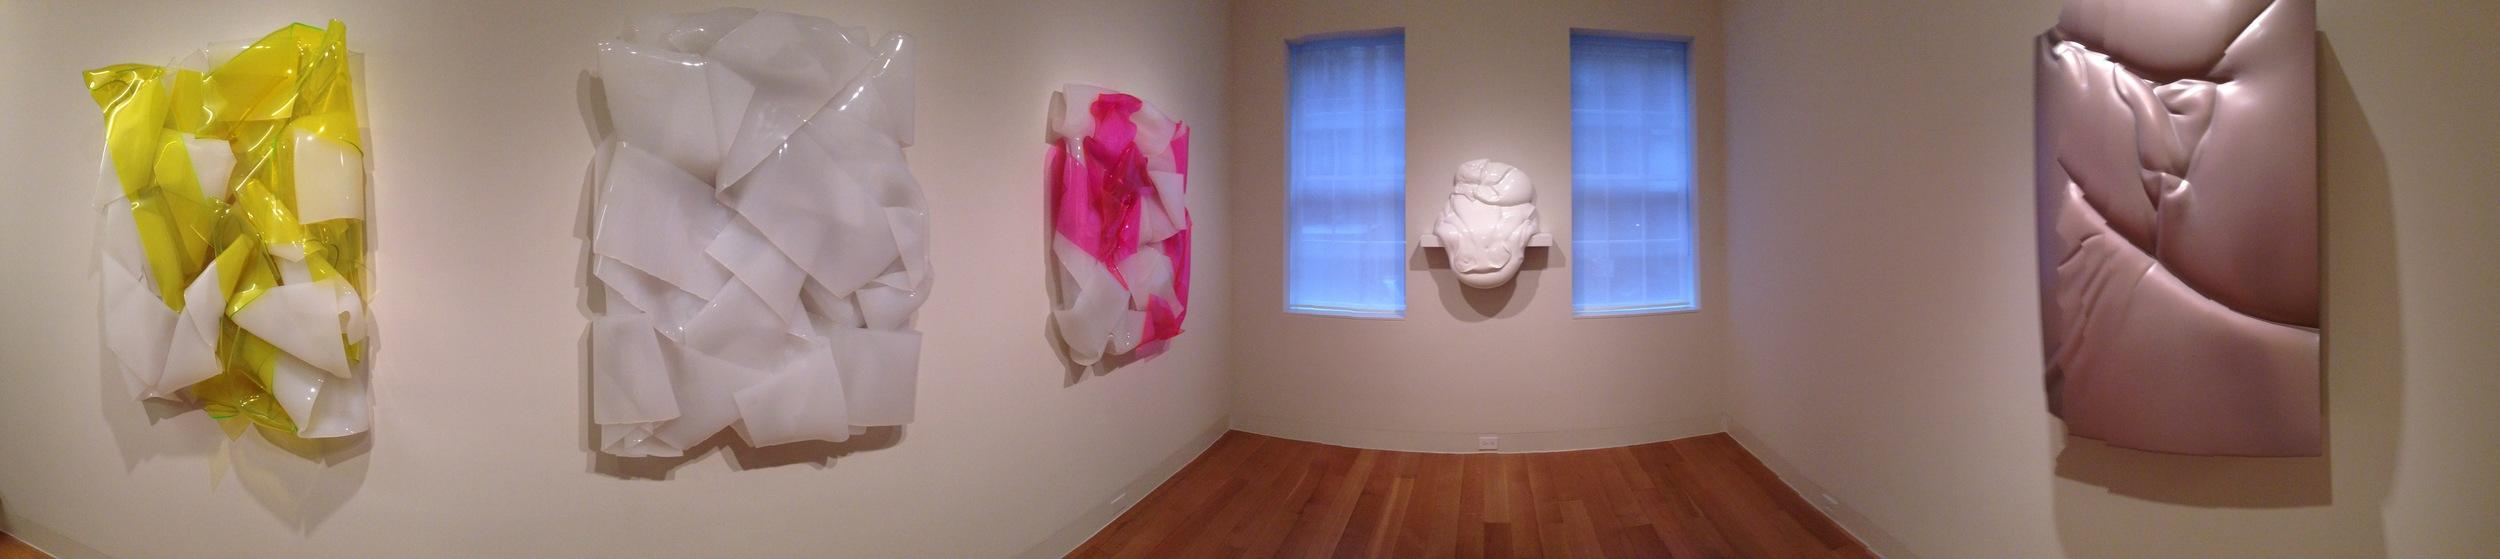 Exhibition Image, César, Luxembourg & Dayan, New York Photo Credit: Cincala ArtAdvisory